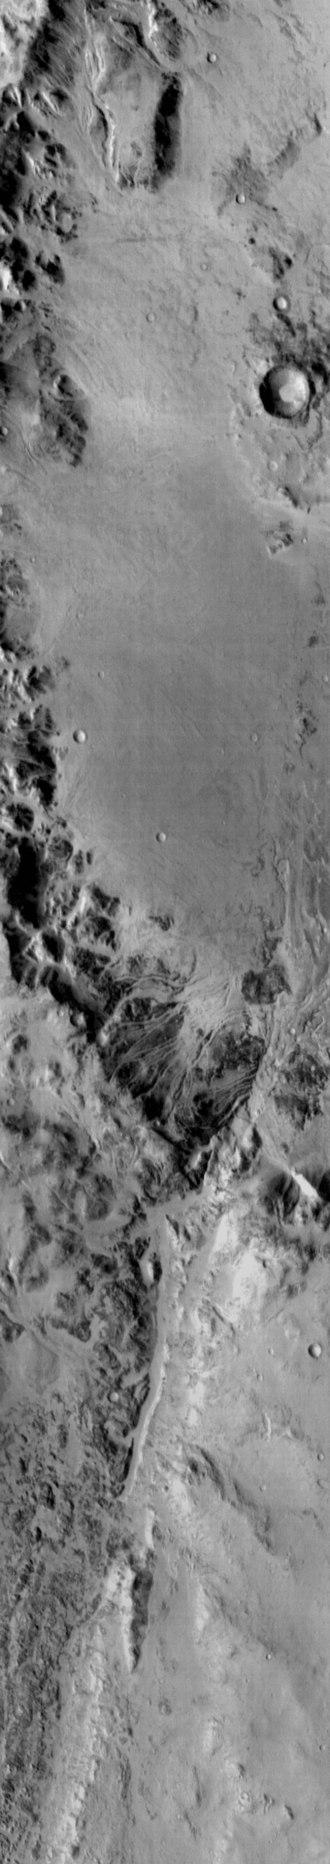 Holden (Martian crater) - Image: Holden Crater Rim